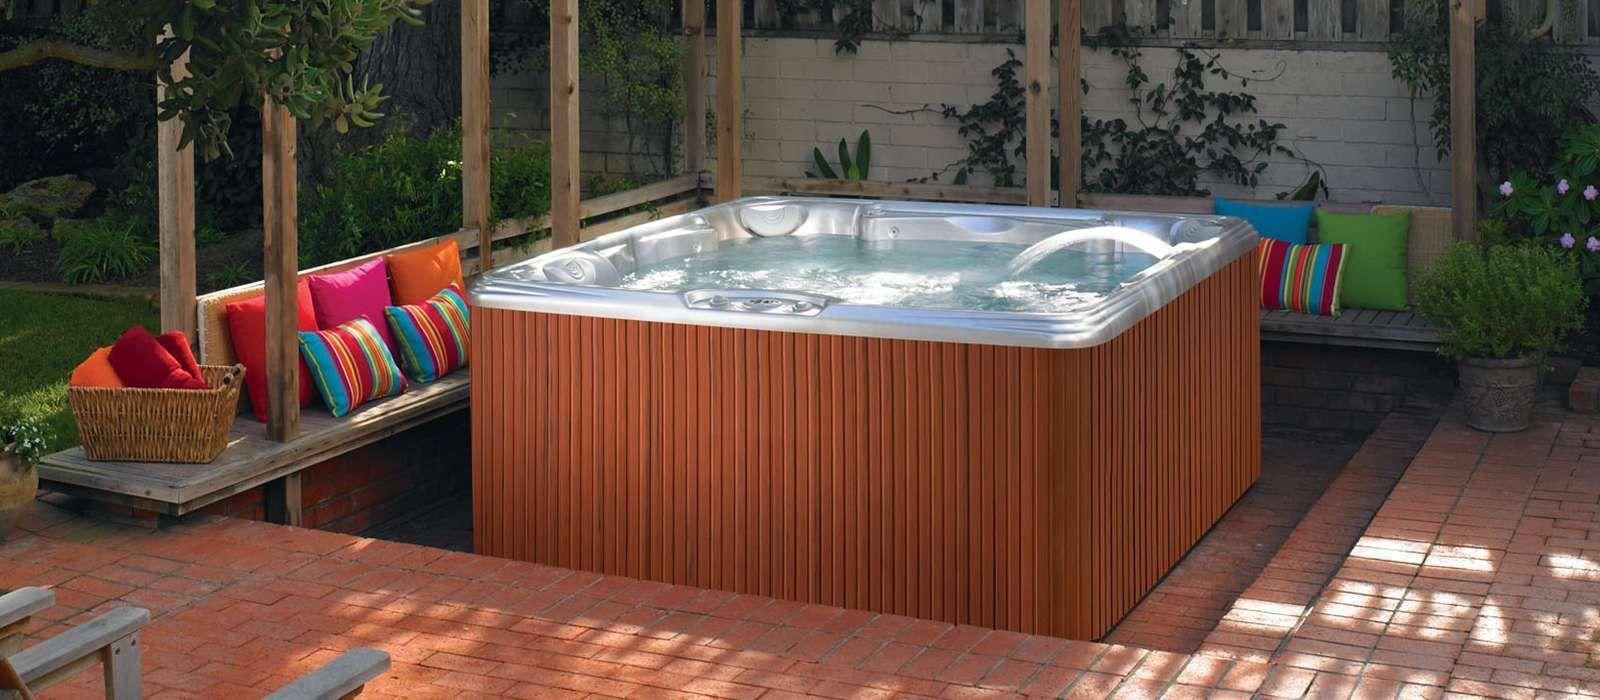 Patio Hot Tub Ideas - Backyard Hardscape - Hot Tub Designs